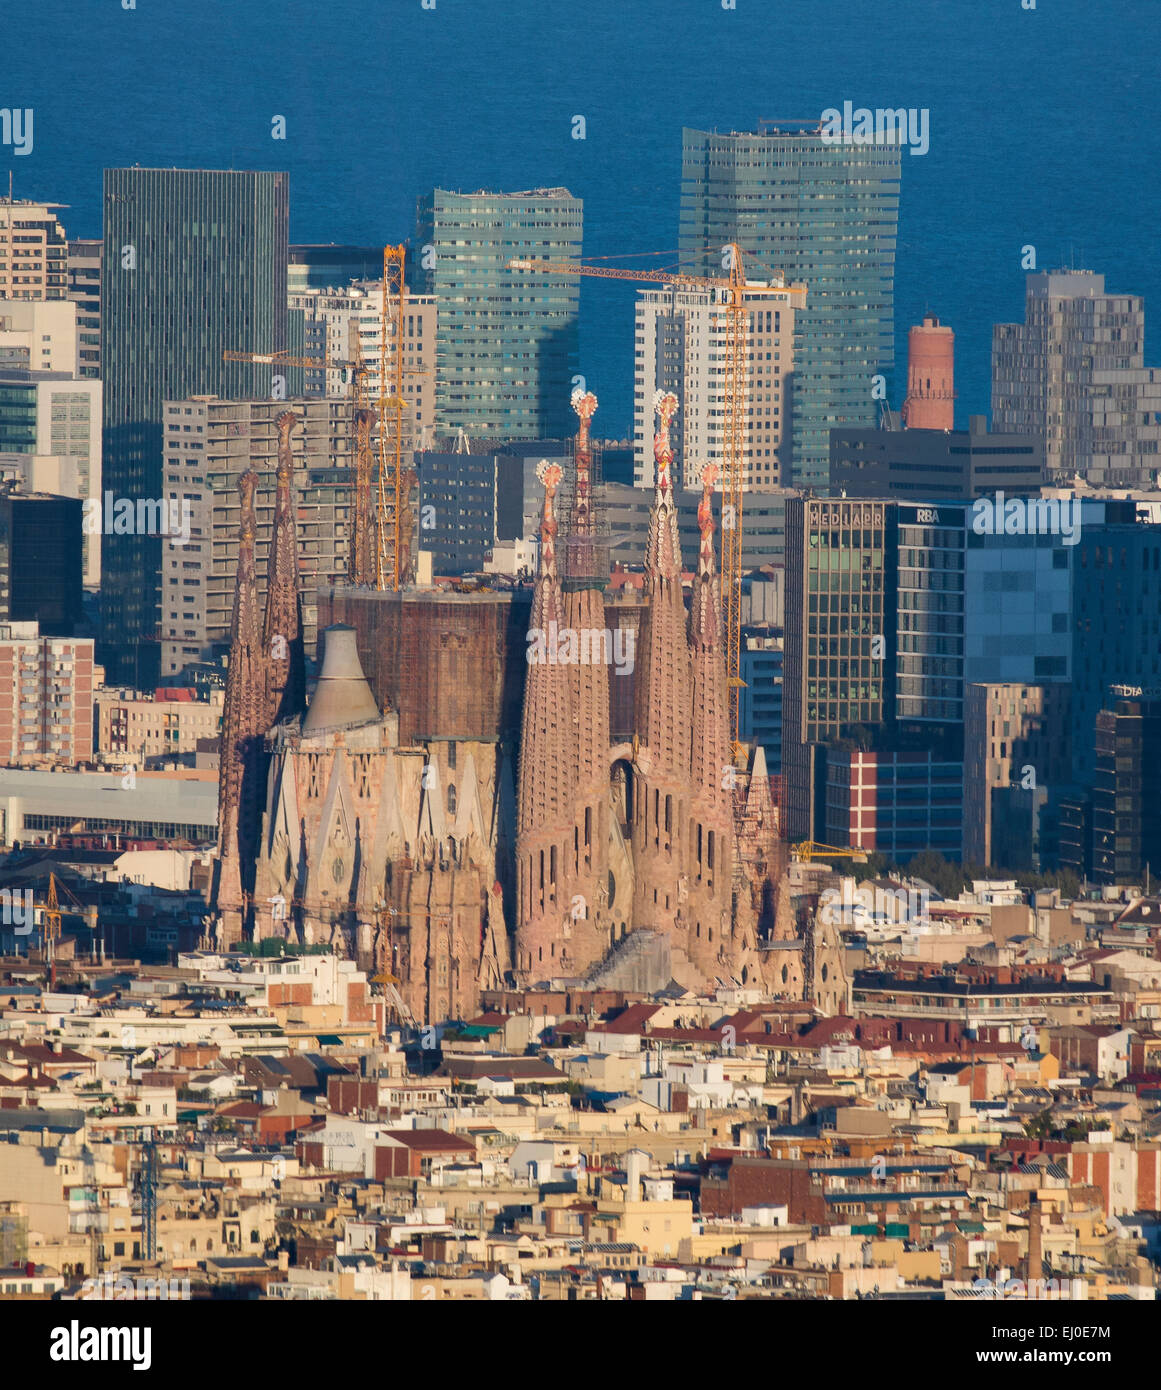 Barcelona City: Barcelona, City, Cityscape, Sagrada Familia, Church, Spain